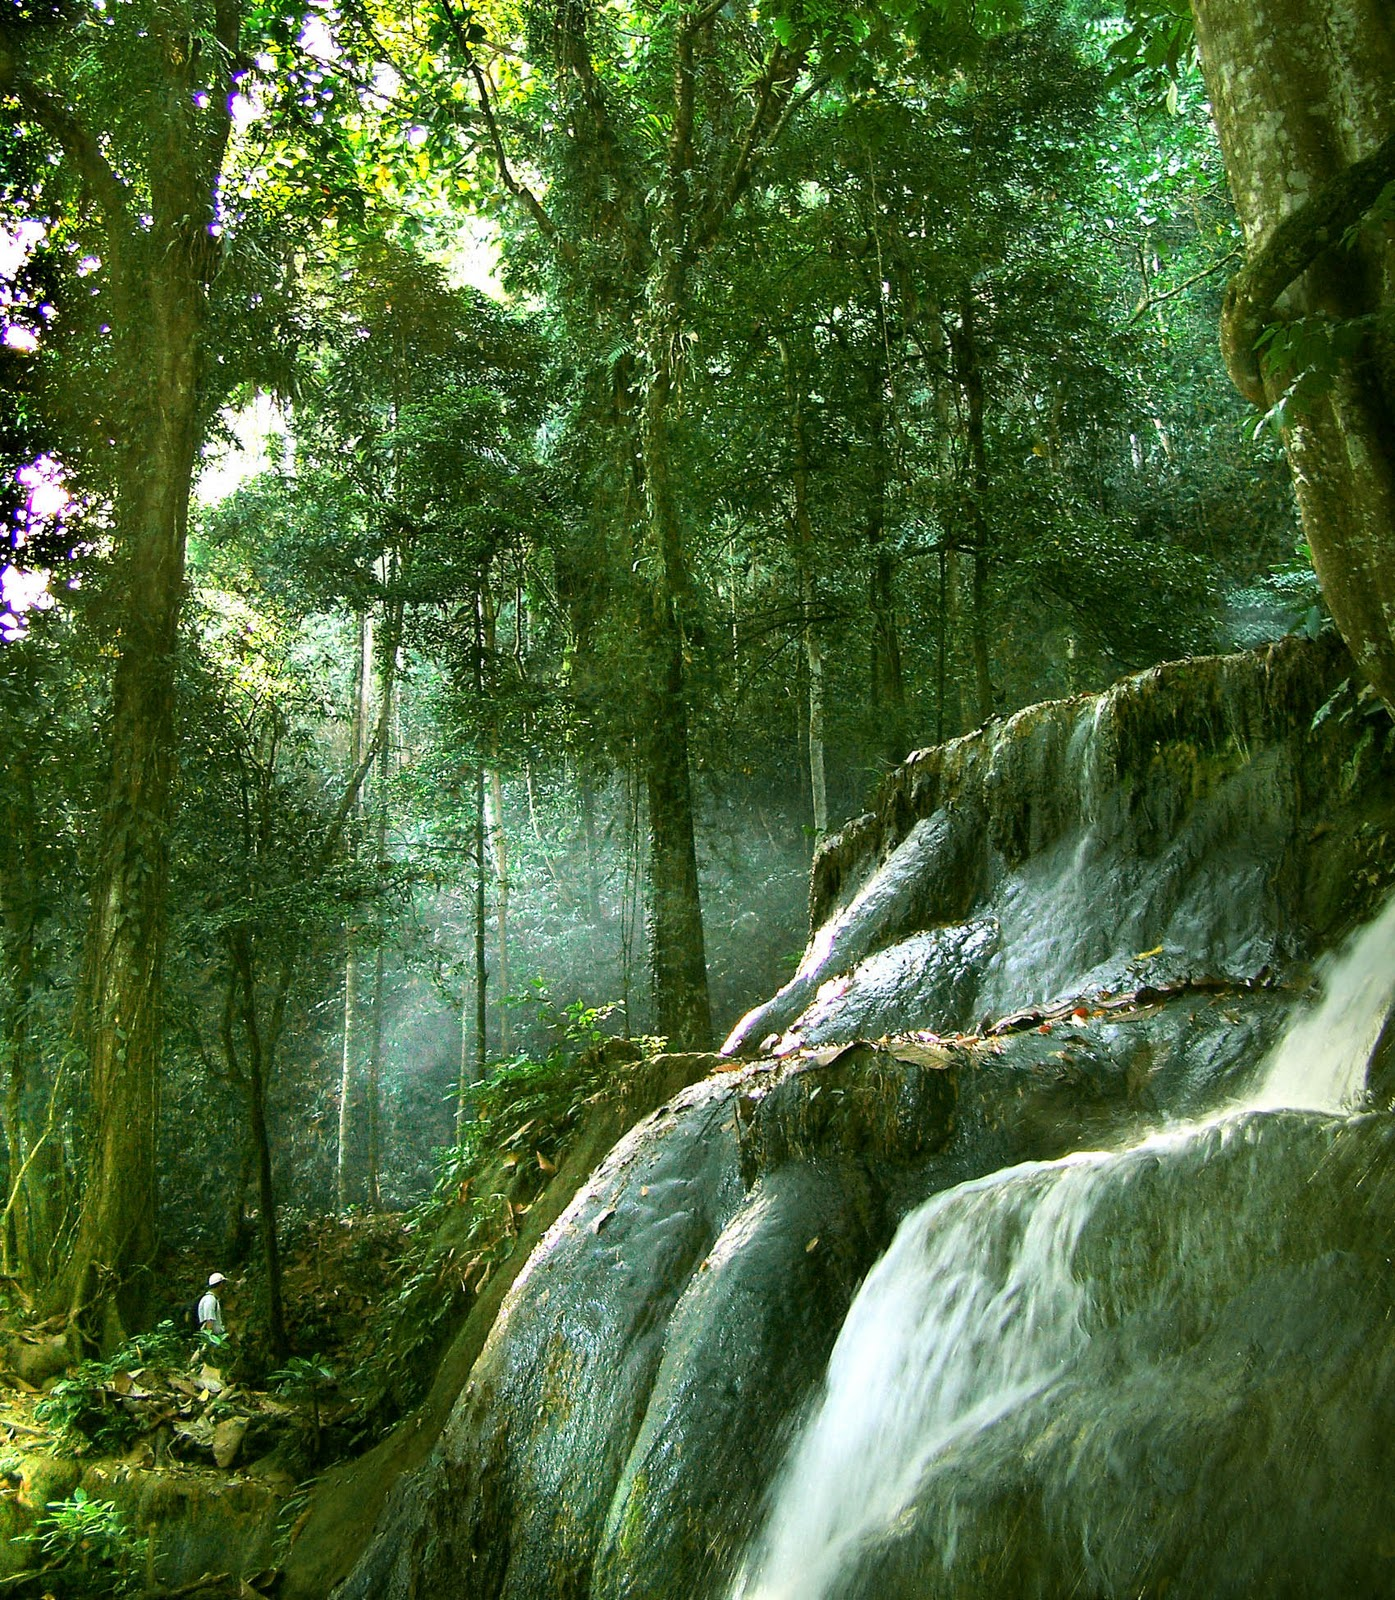 55 Gambar Pemandangan Hutan Untuk Diwarnai HD